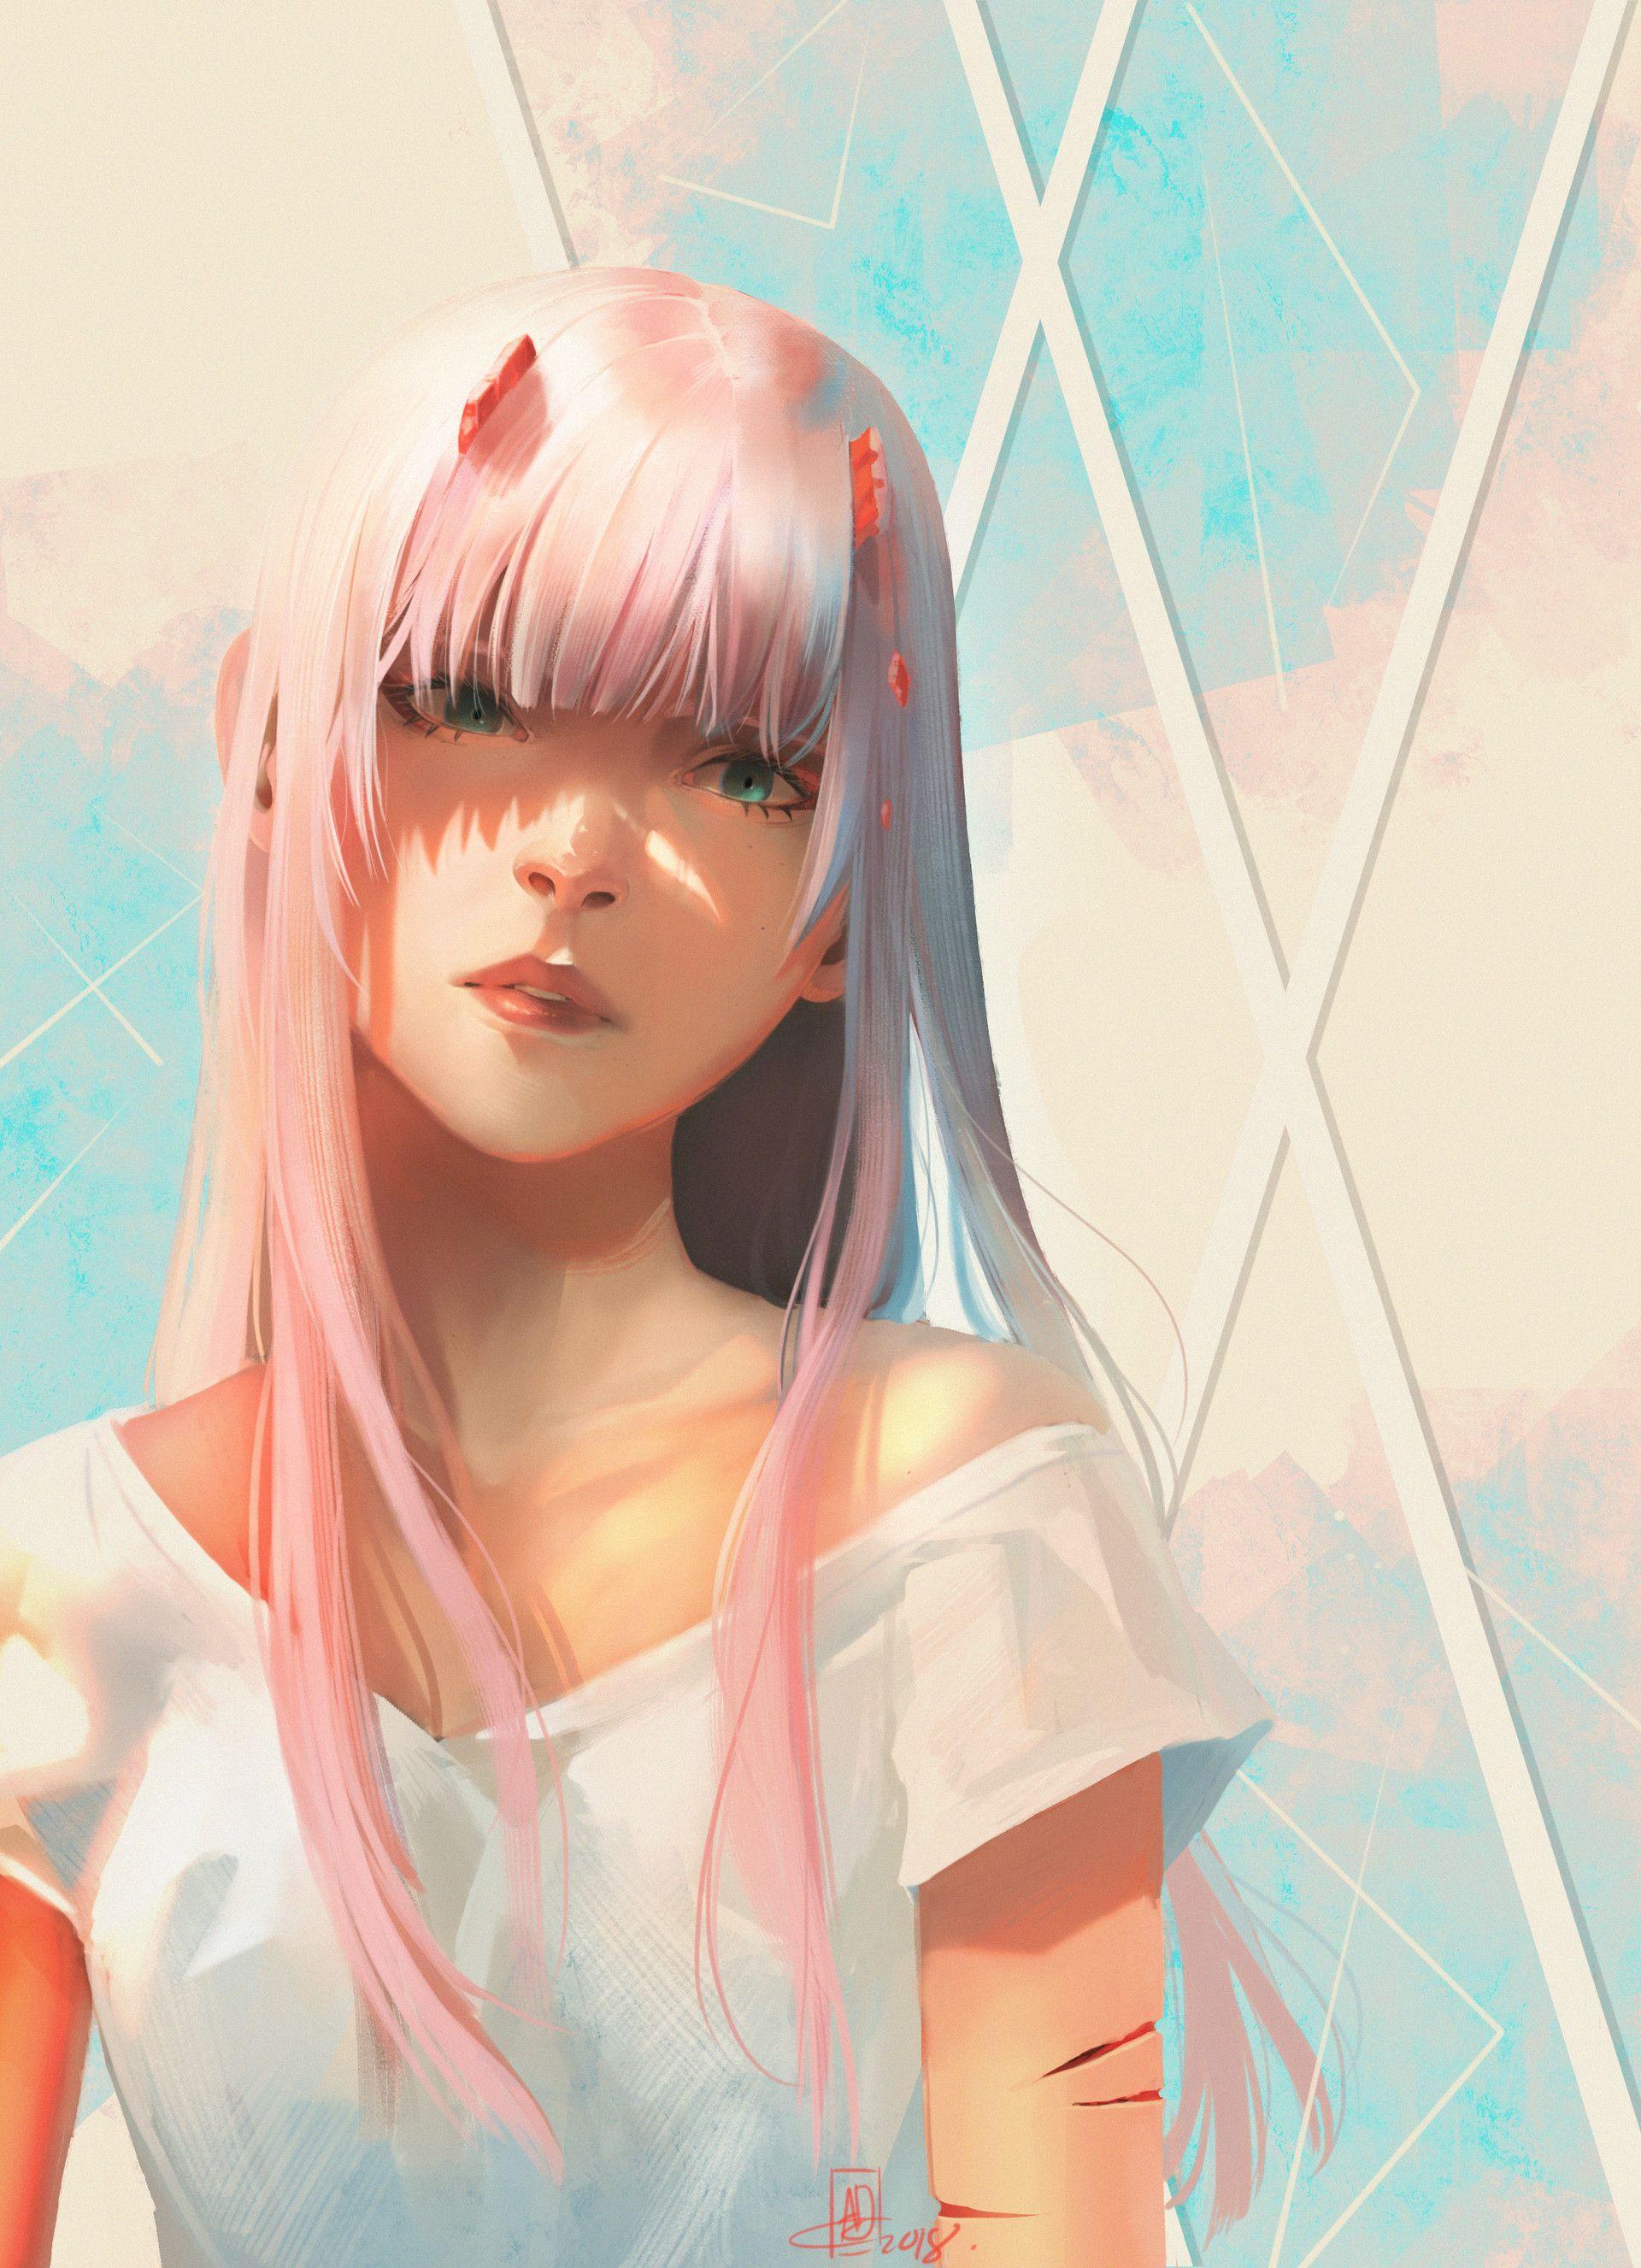 ArtStation - Zero Two, Annie Doyon | Anime, Mecha anime ...